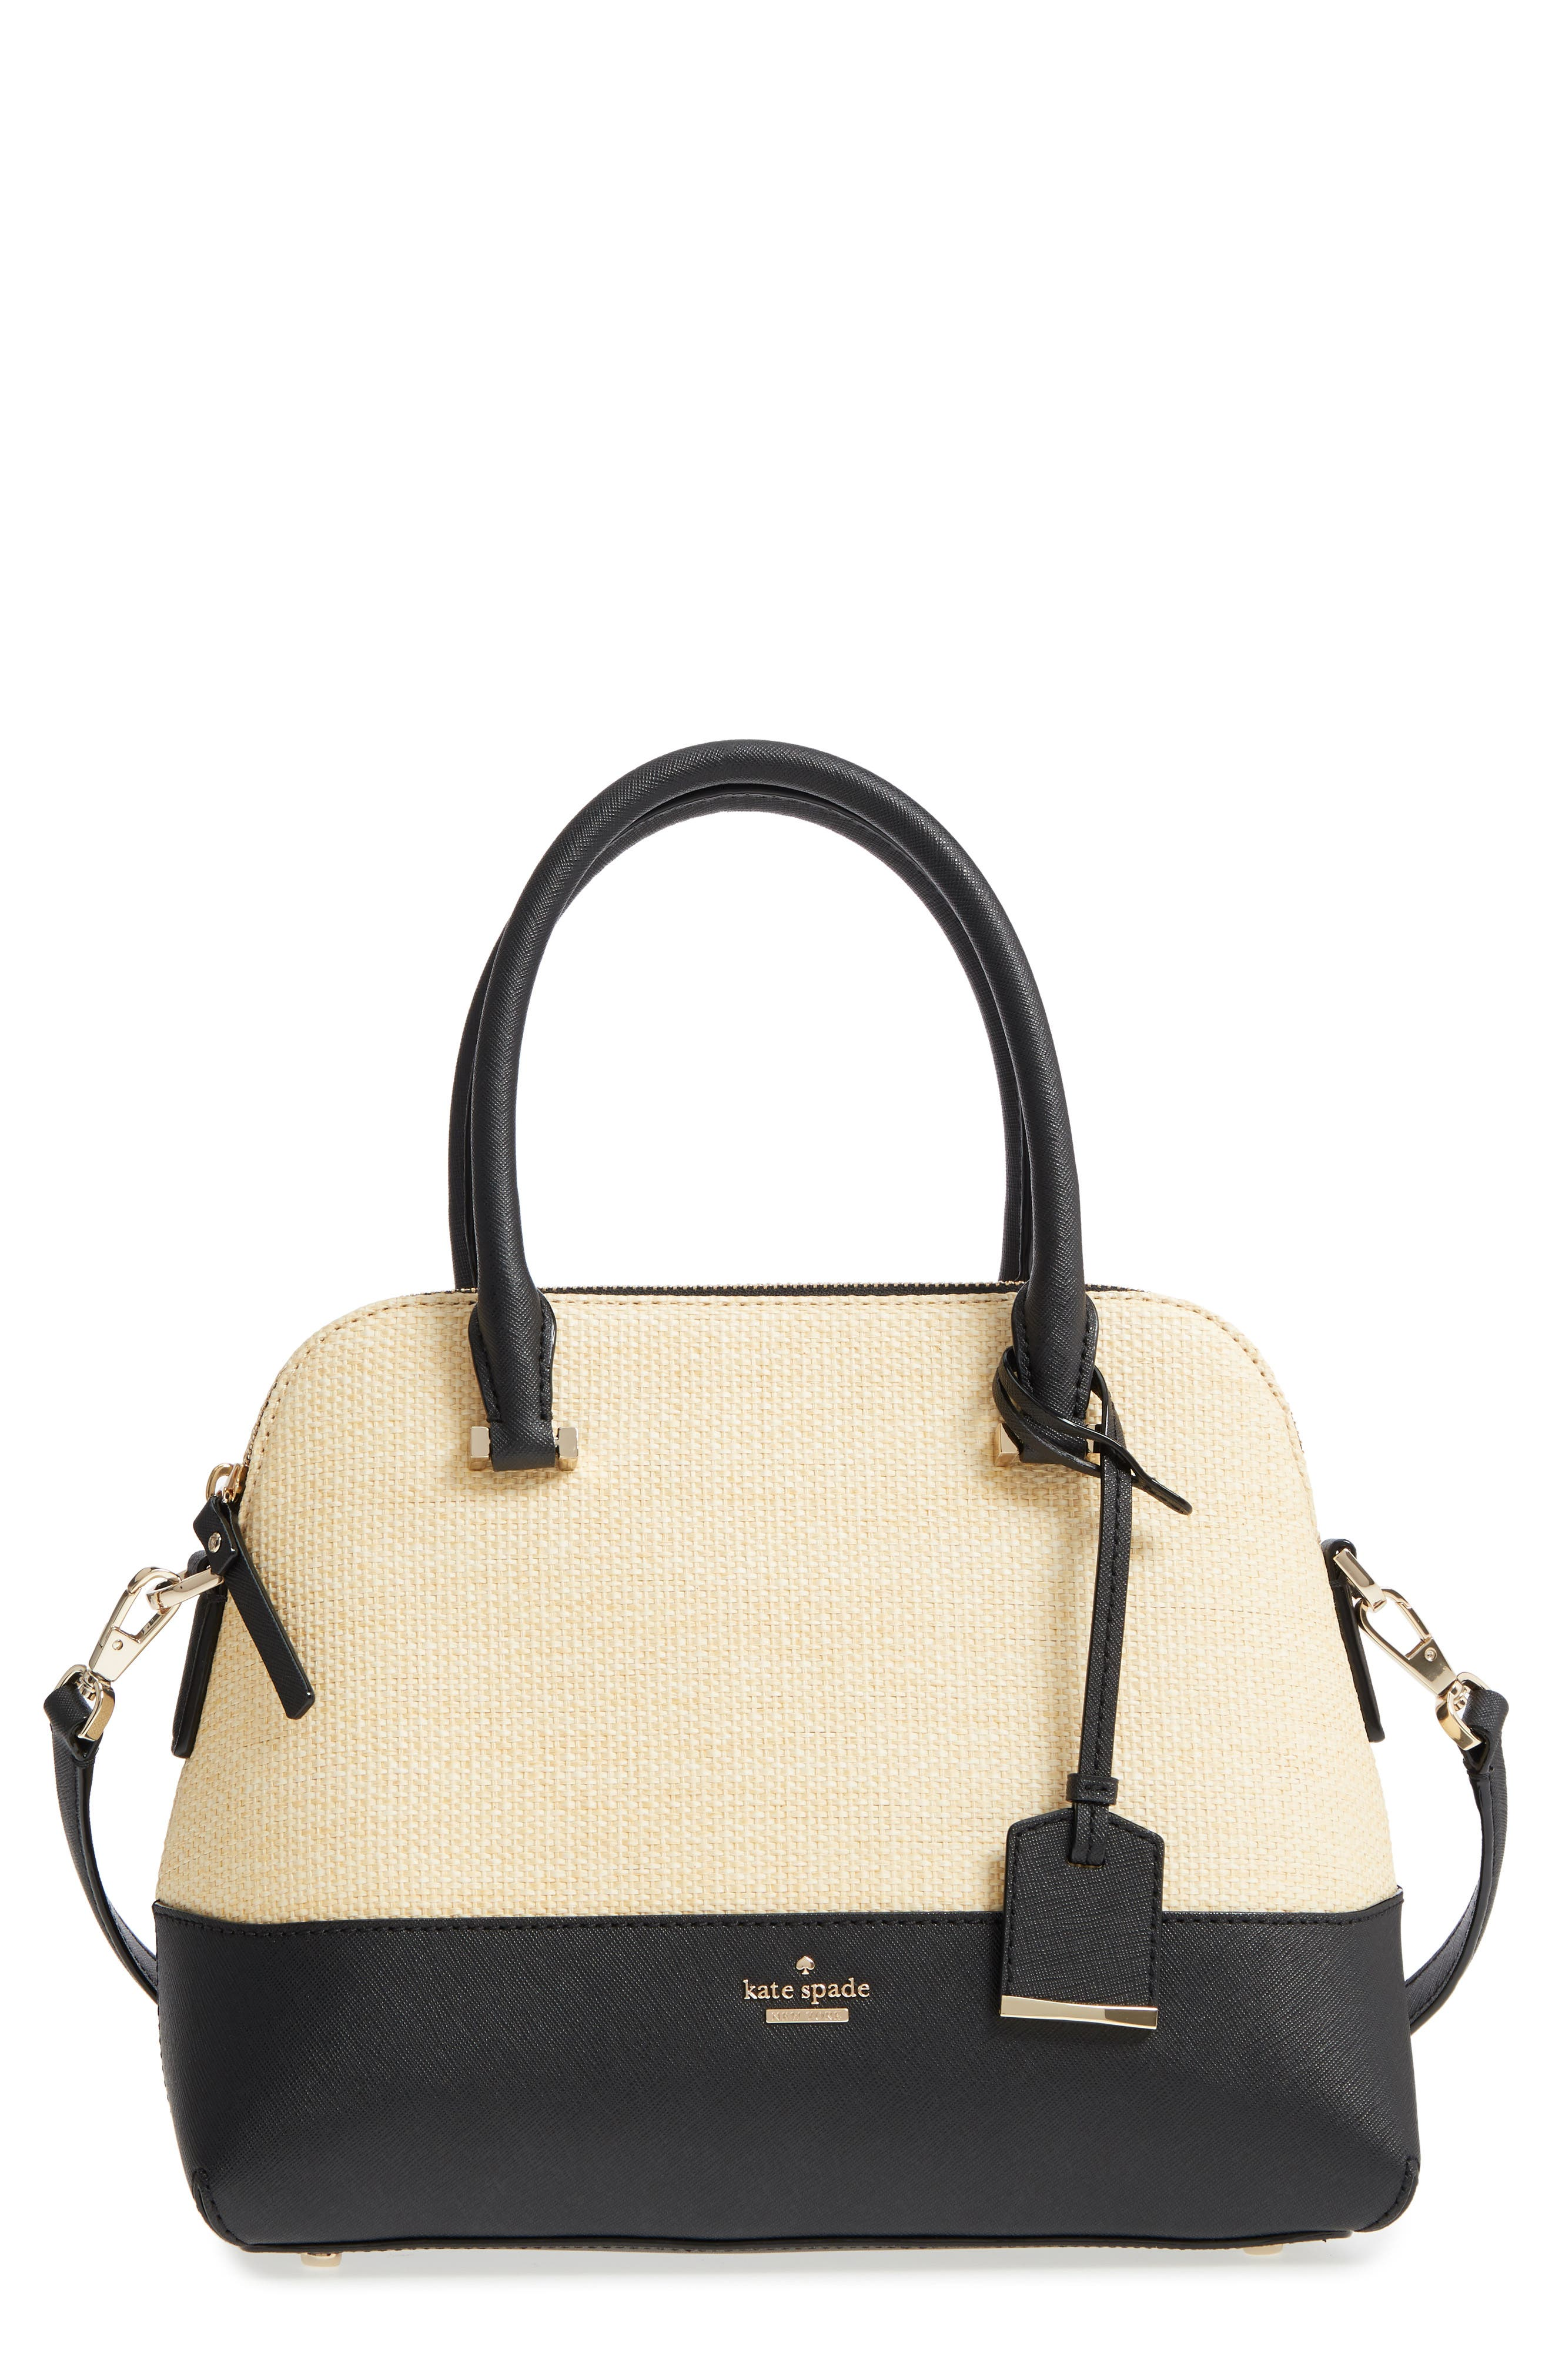 kate spade new york cameron street - straw & leather maise satchel